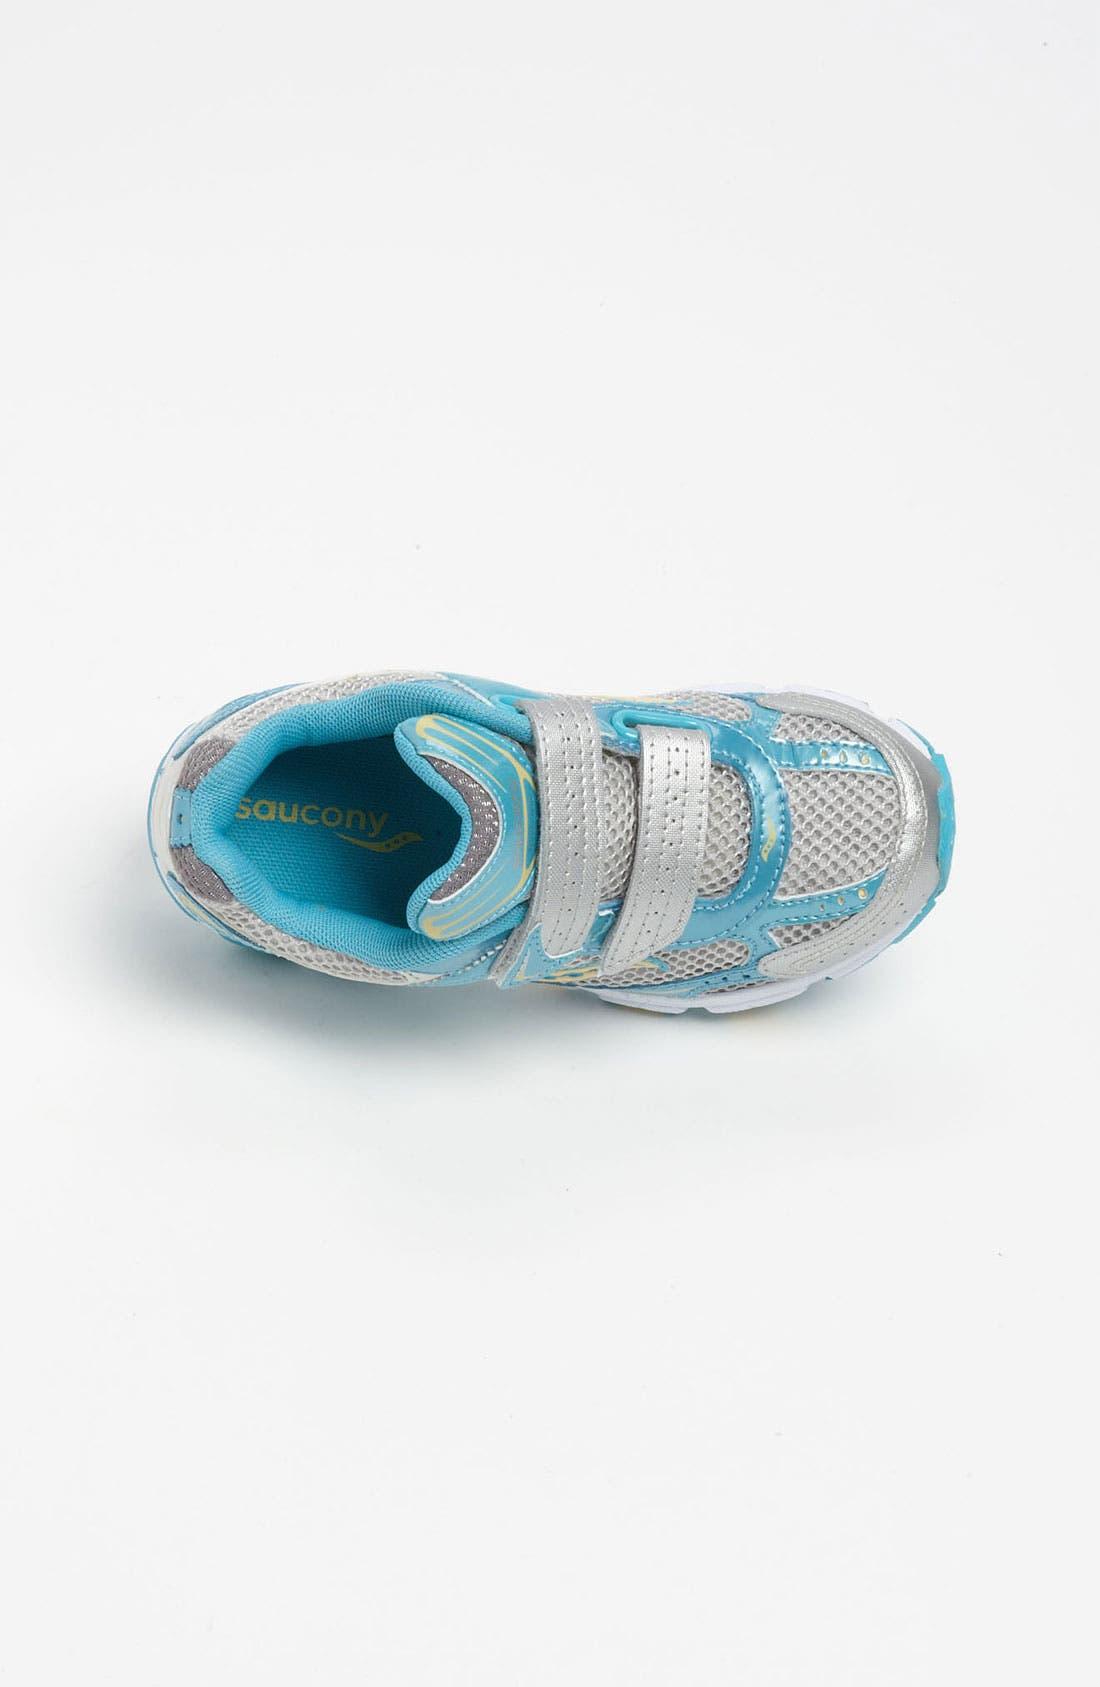 Alternate Image 3  - Saucony 'Grid Profile' Sneaker (Toddler & Little Kid)